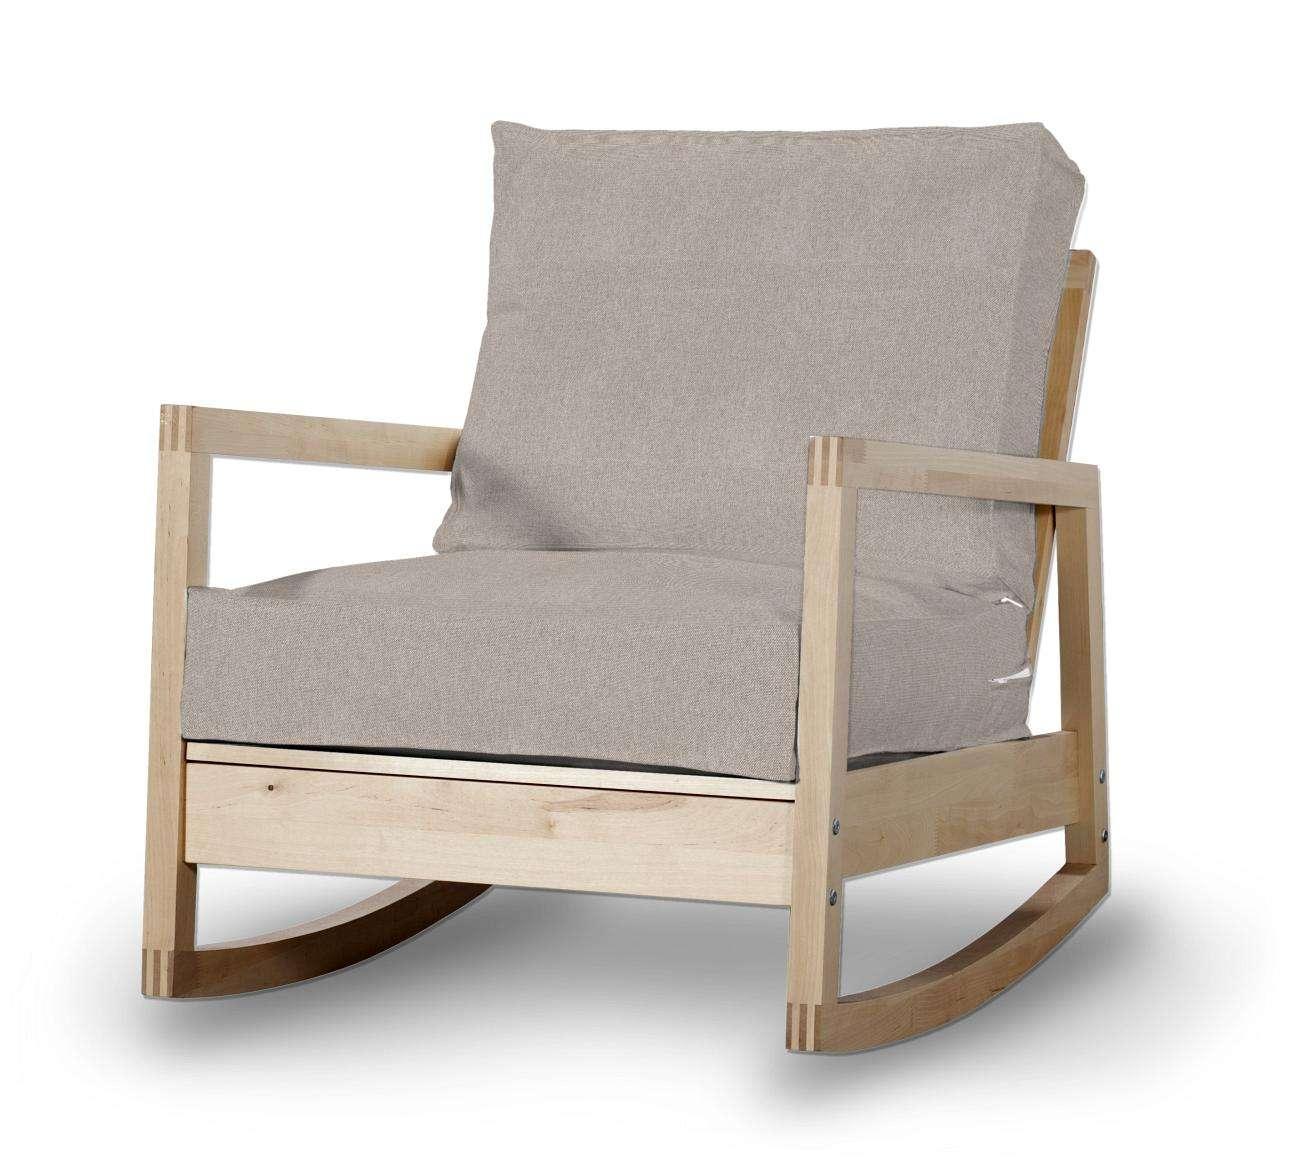 Lillberg Sesselbezug Sesselhusse, Modell Lillberg von der Kollektion Etna, Stoff: 705-09